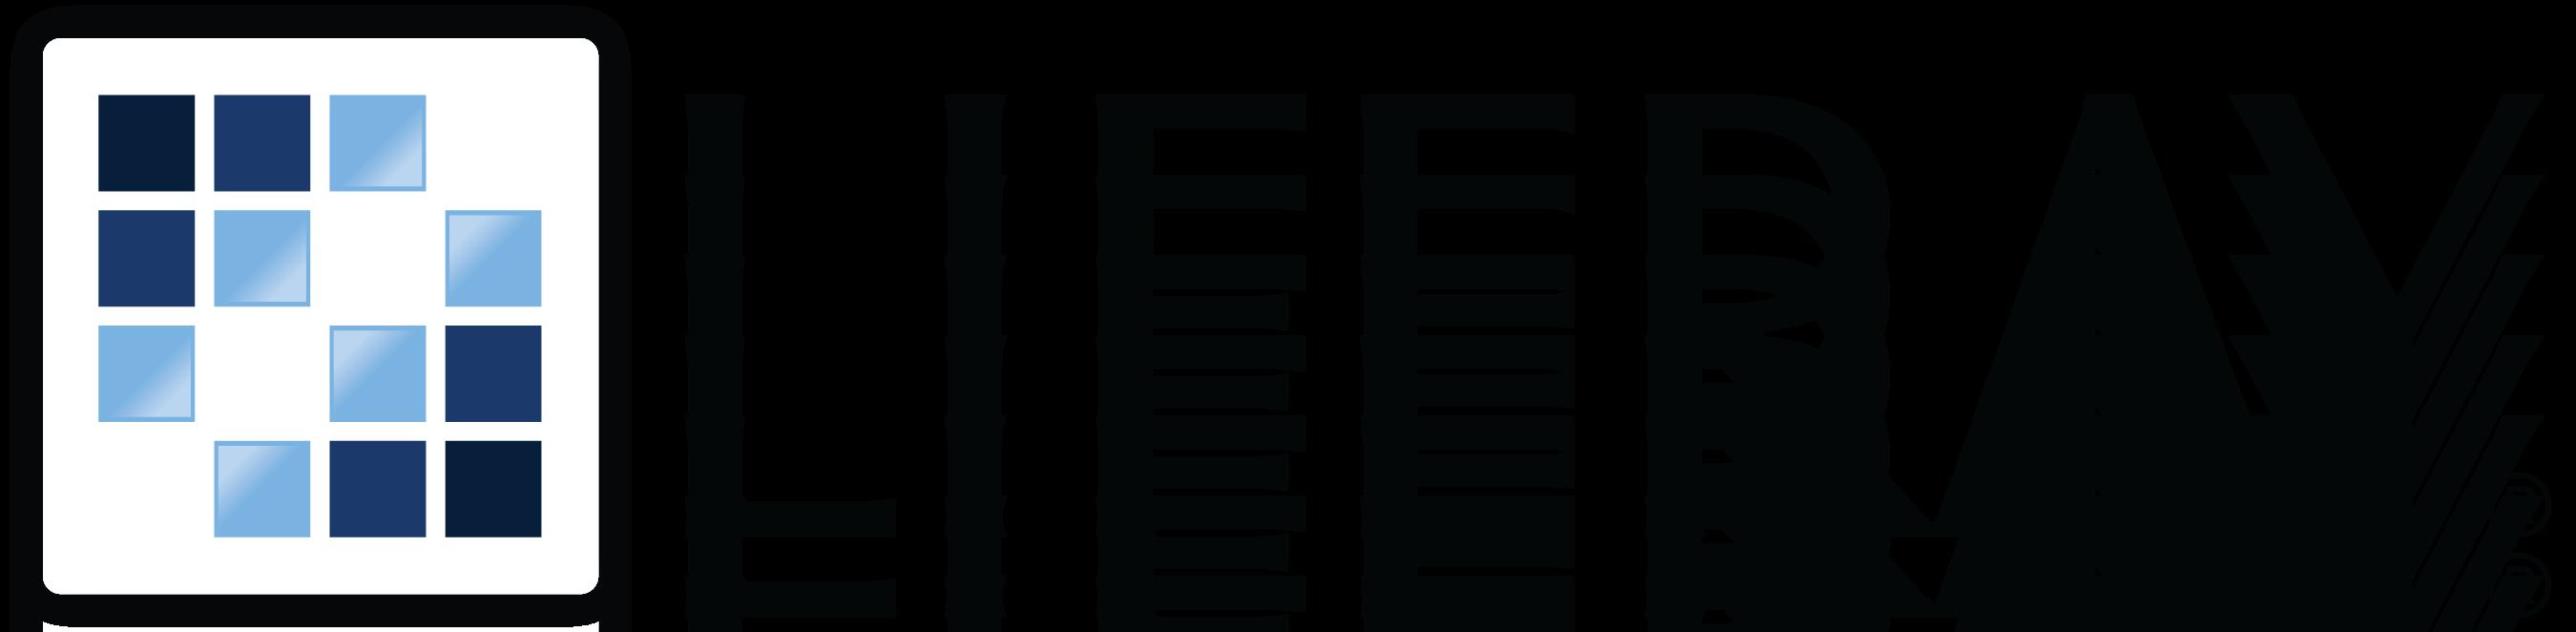 Liferay Partner Conference Recap